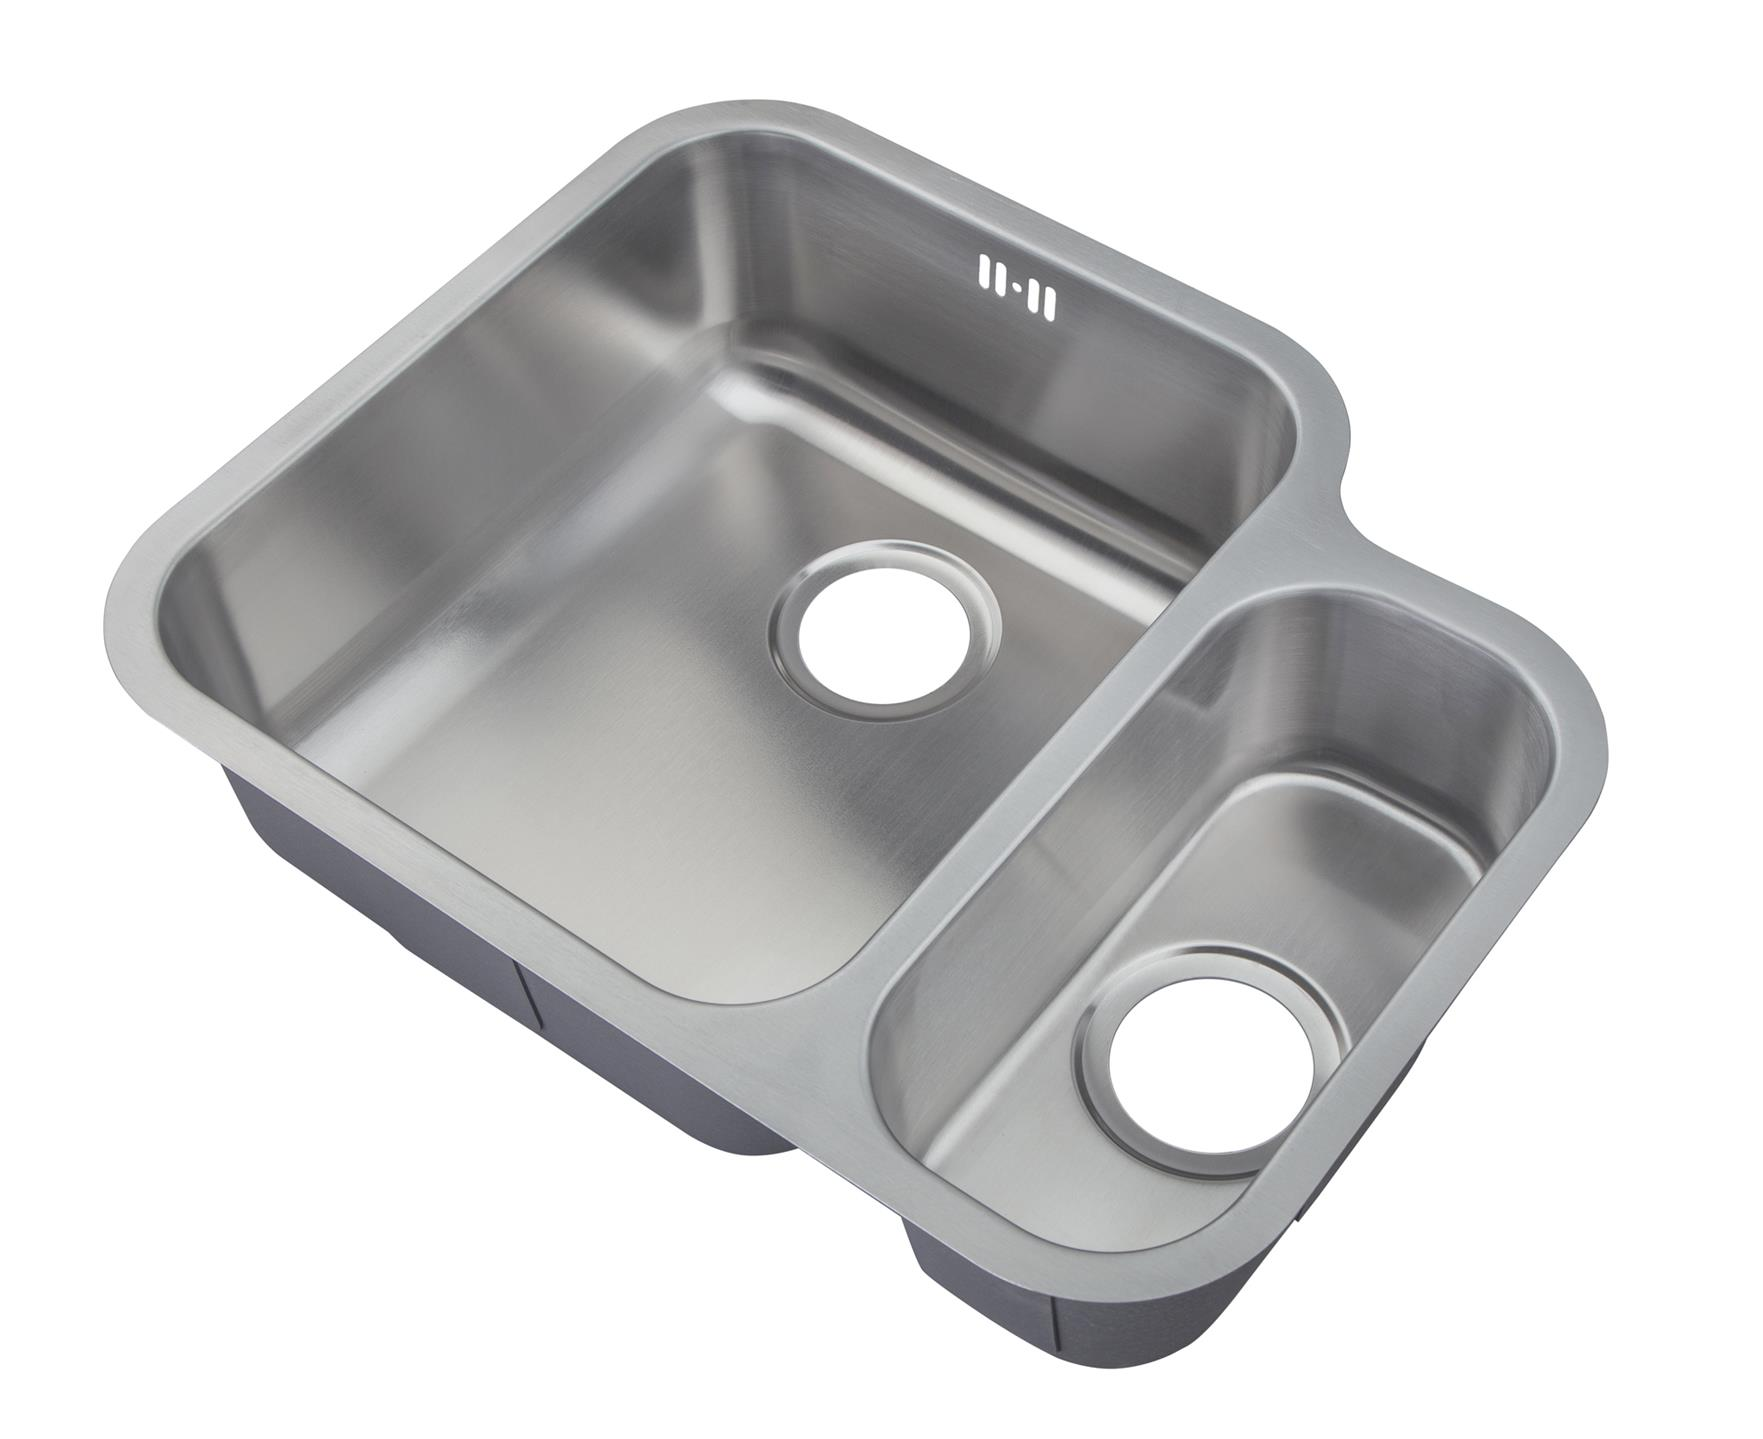 Stainless-Steel-Undermount-Under-Counter-Kitchen-Sinks-Choice-1-0-or-1 ...